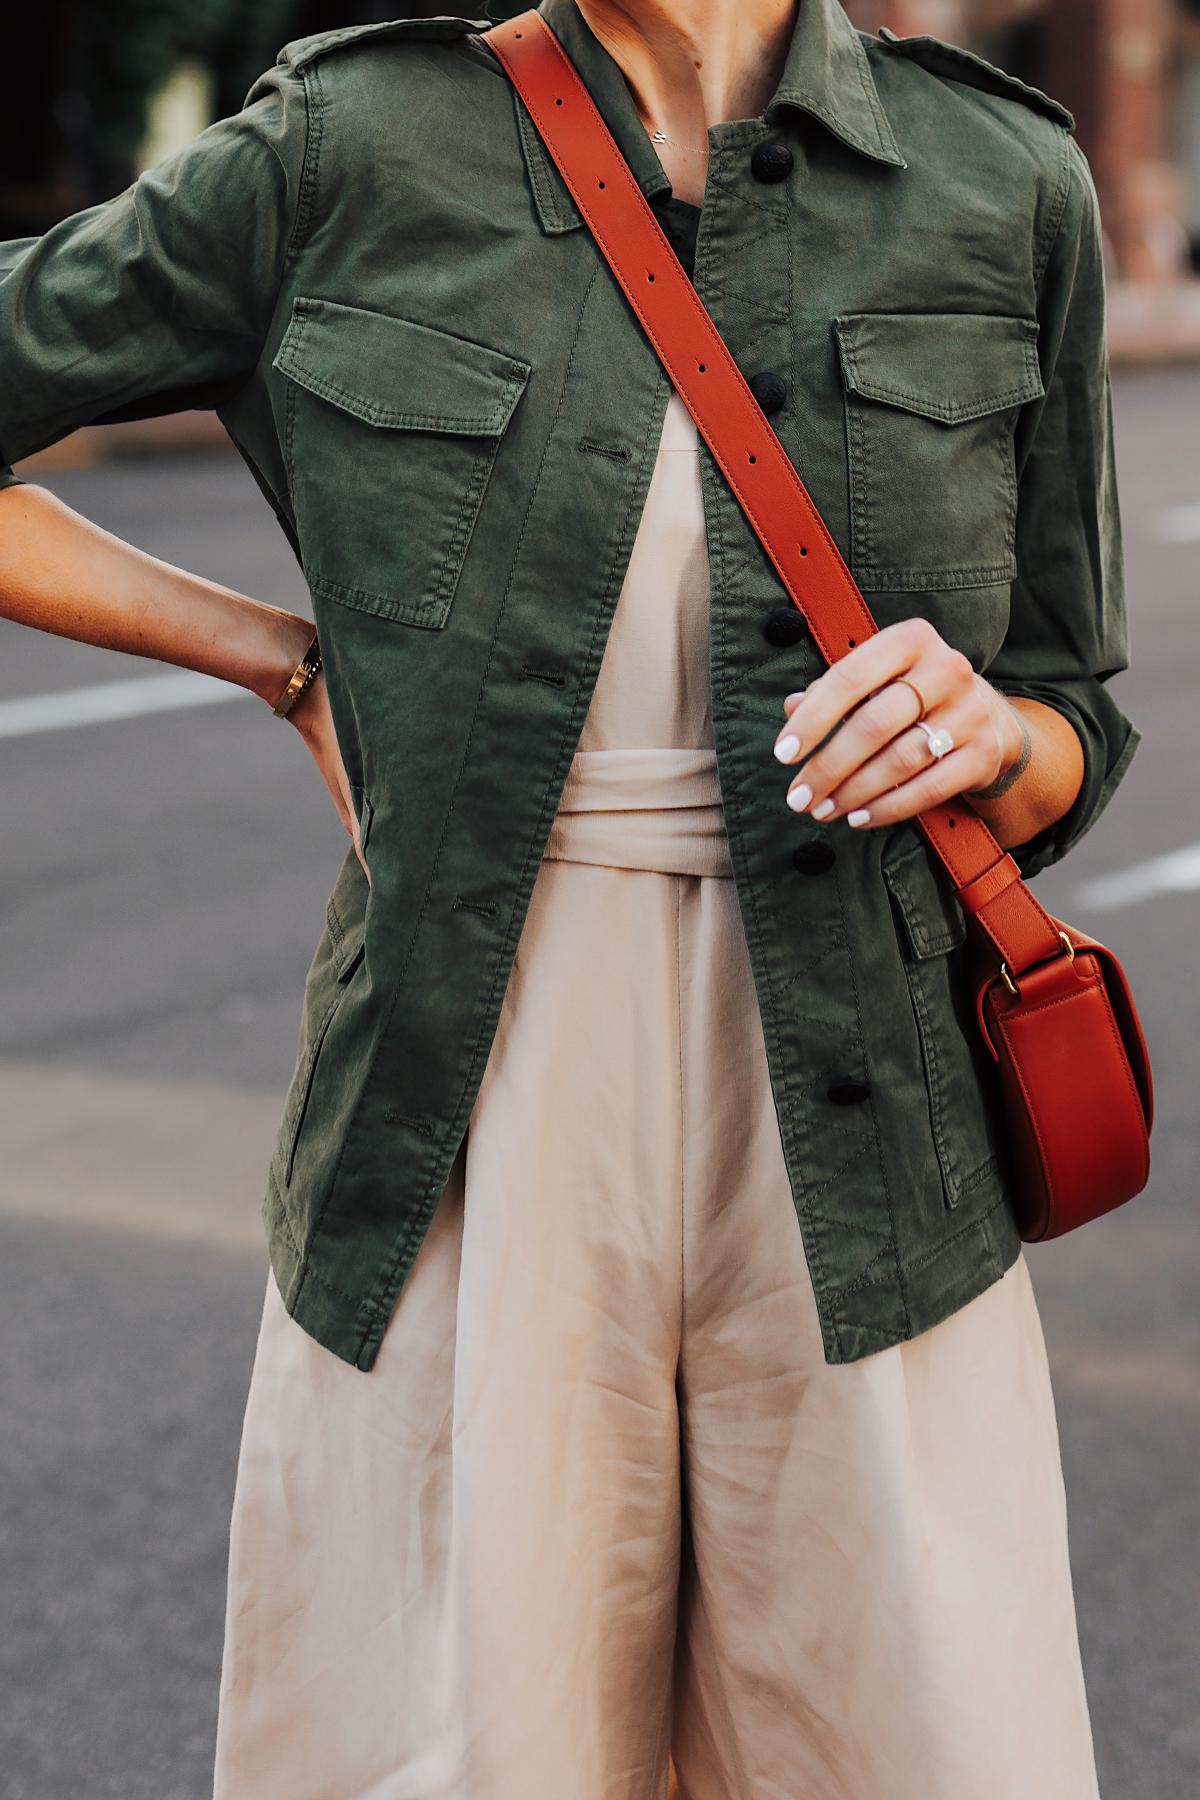 Woman Wearing Banana Republic Beige Linen Jumpsuit Green Utility Jacket Tan Crossbody Handbag Fashion Jackson San Diego Fashion Blogger Street Style